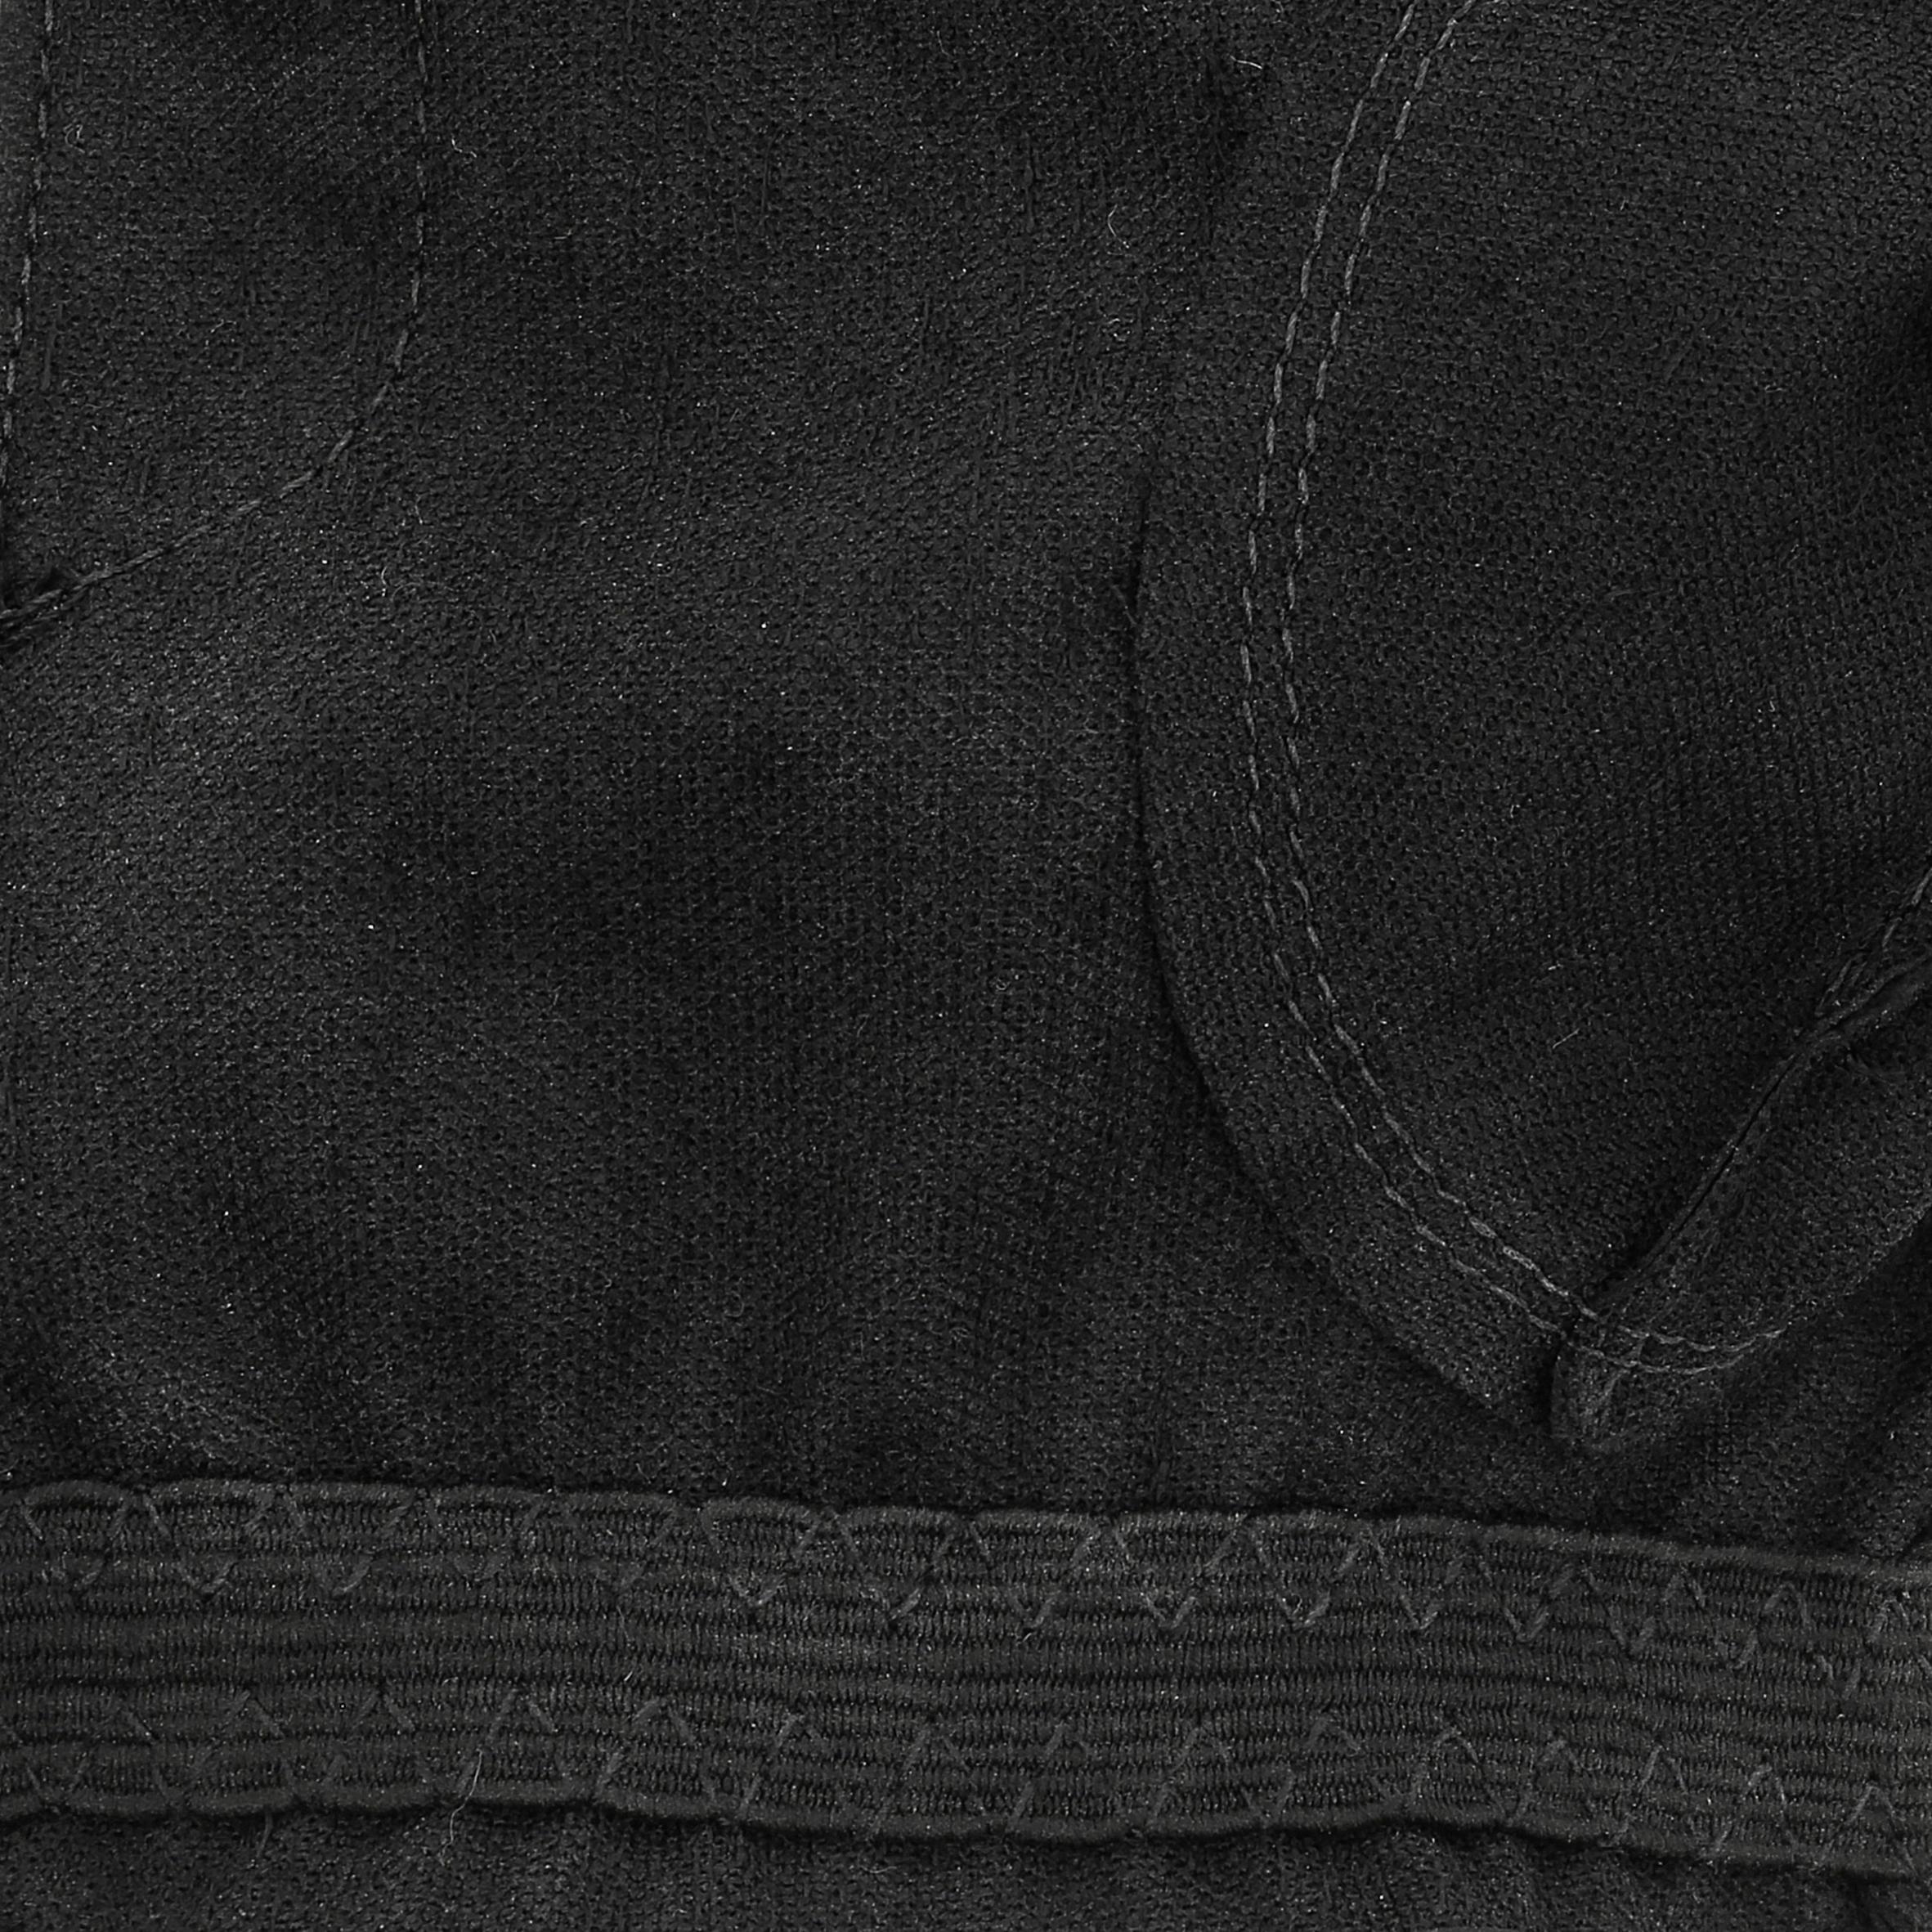 Adult Horse Riding Grippy Gloves -Black